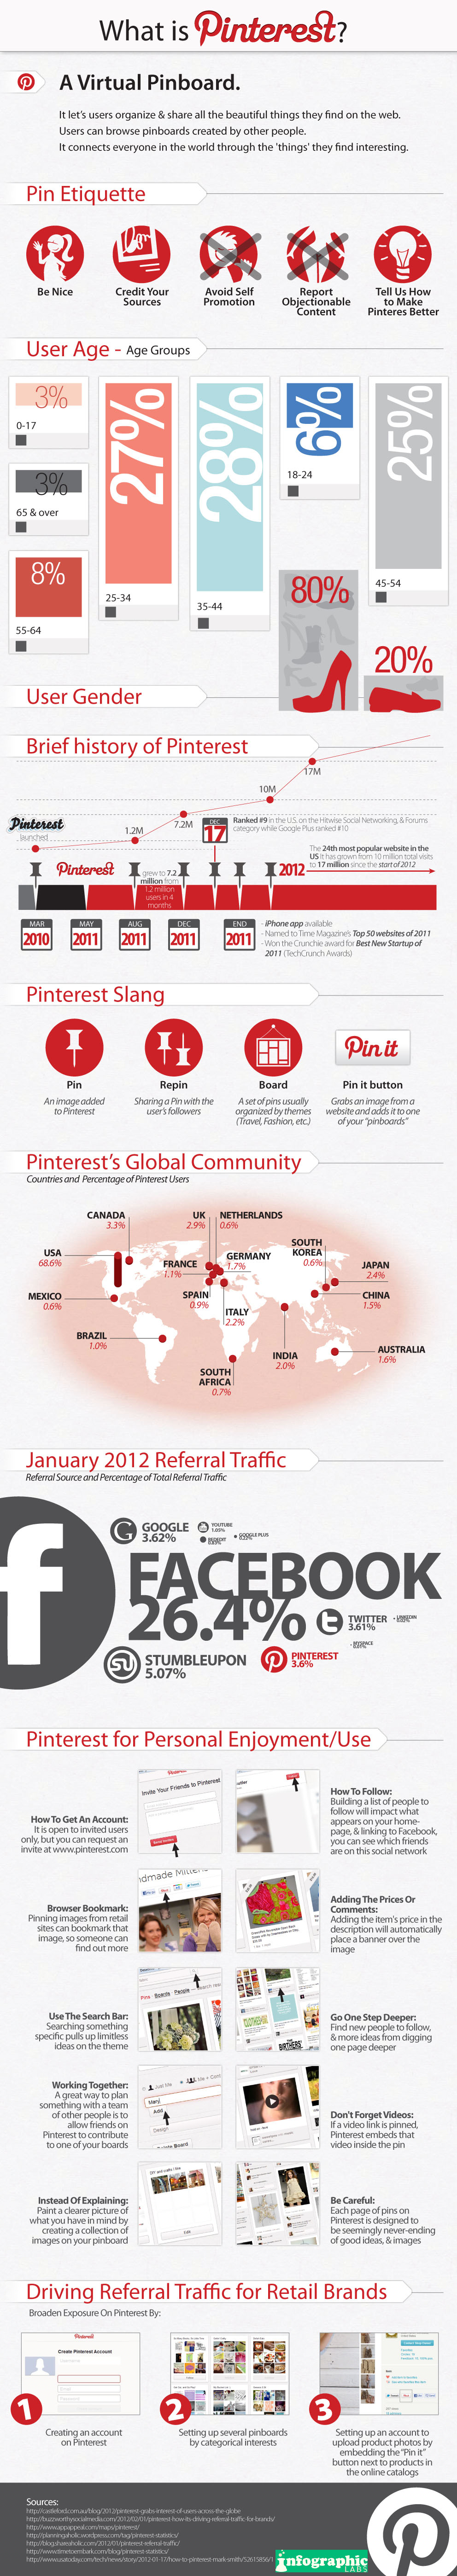 pinterest-2012-infographic